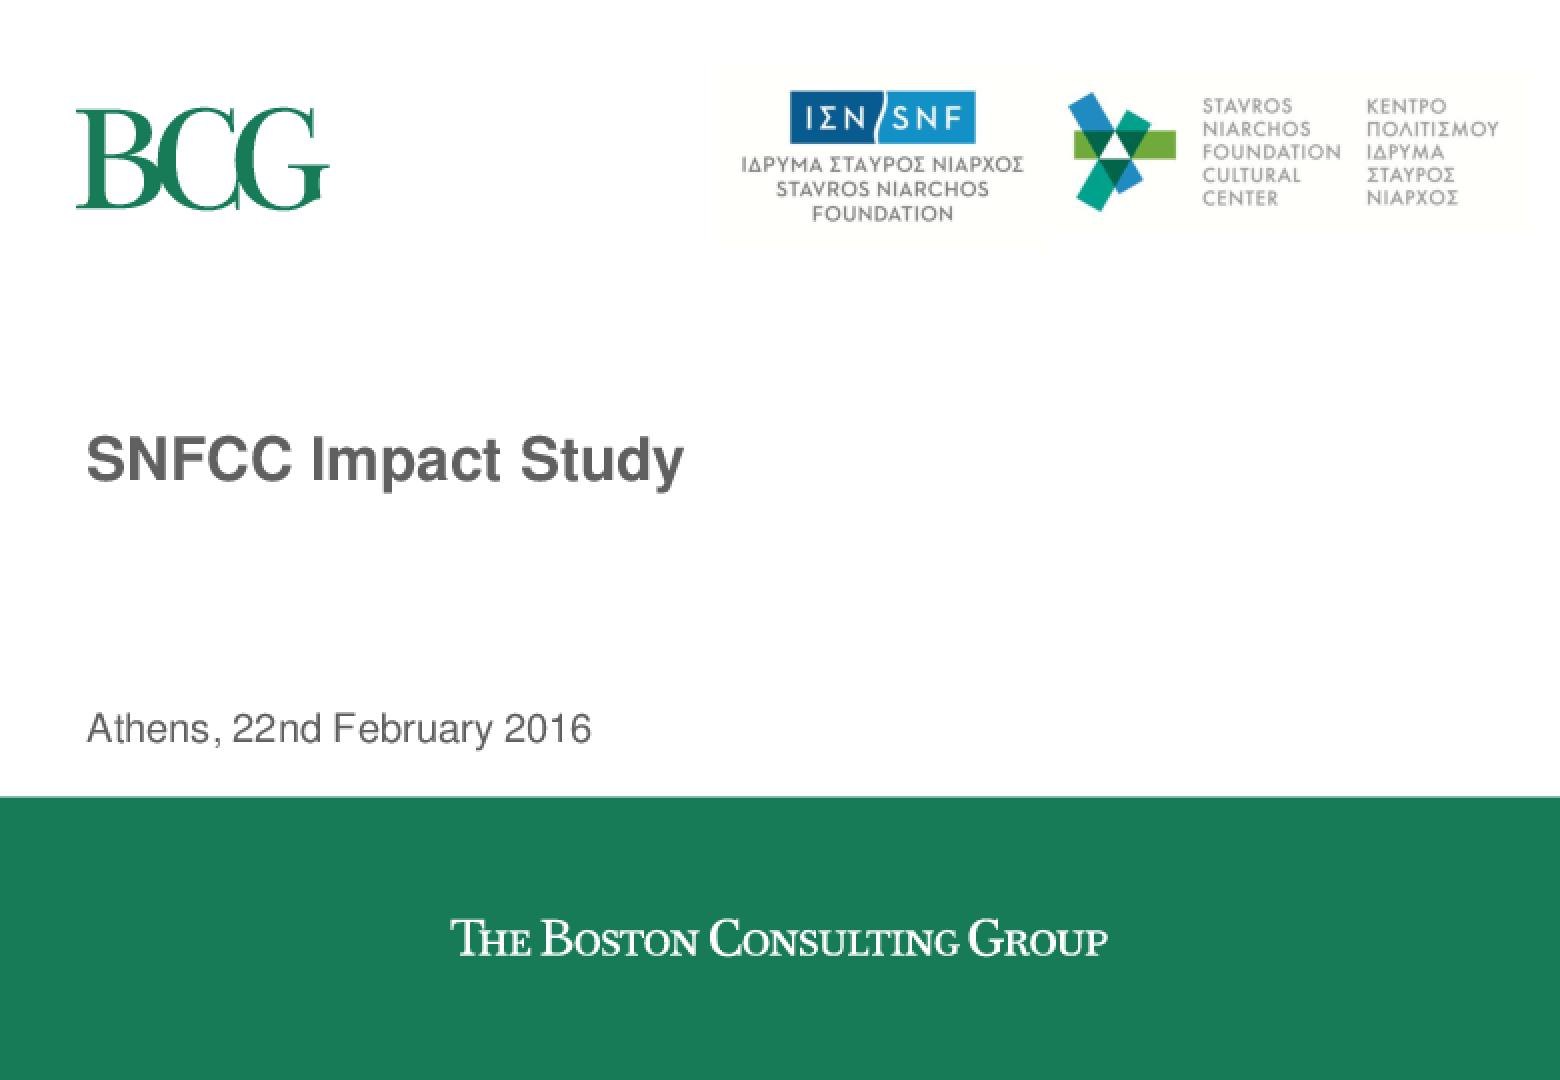 Stavros Niarchos Foundation Cultural Center (SNFCC) Impact Study